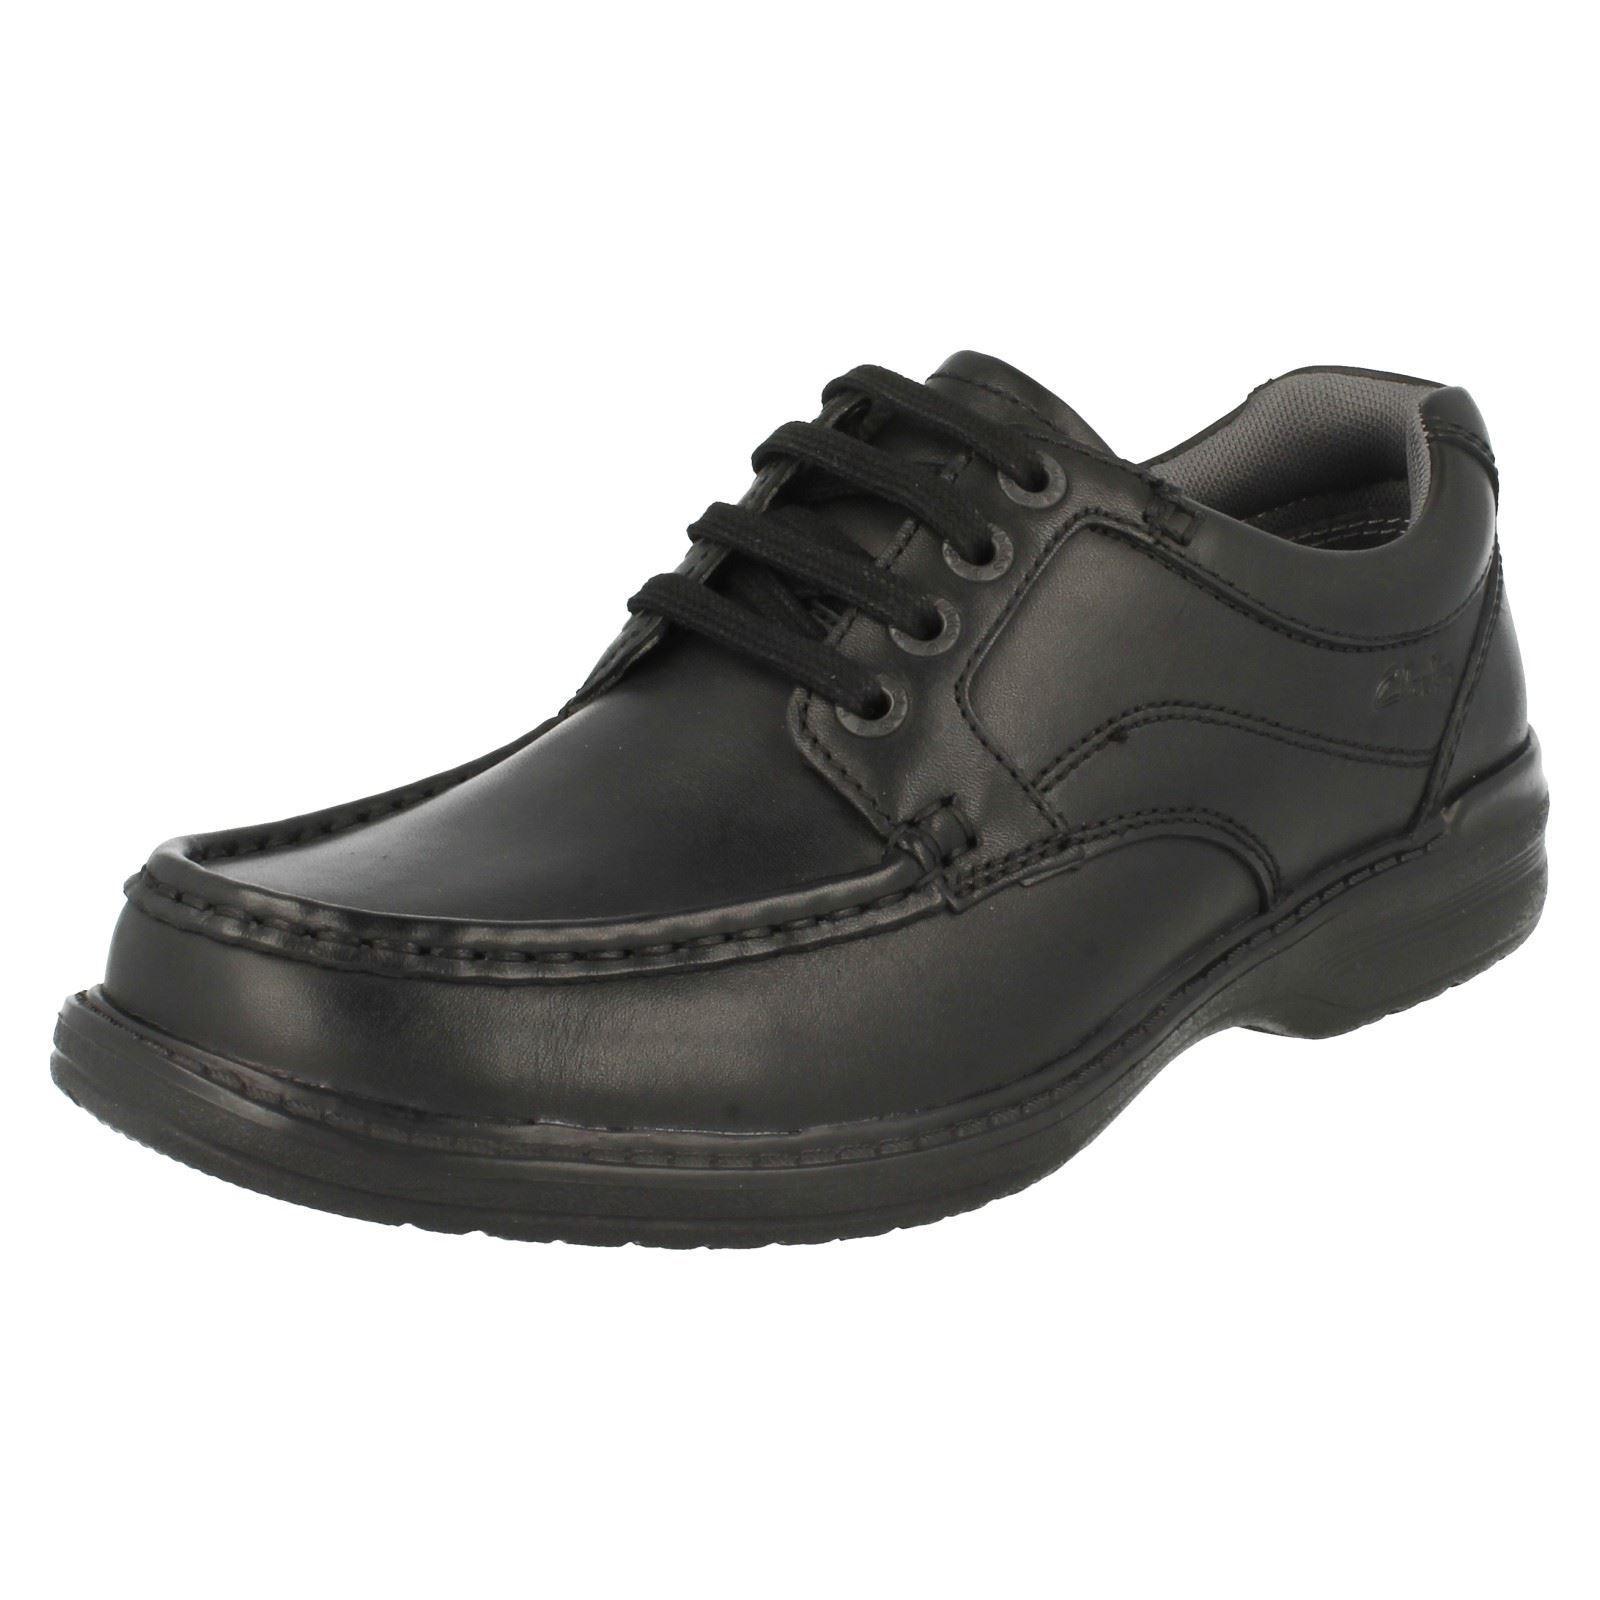 Herren CLARKS schwarze geschnürte Leder Keeler Walk H- Passform